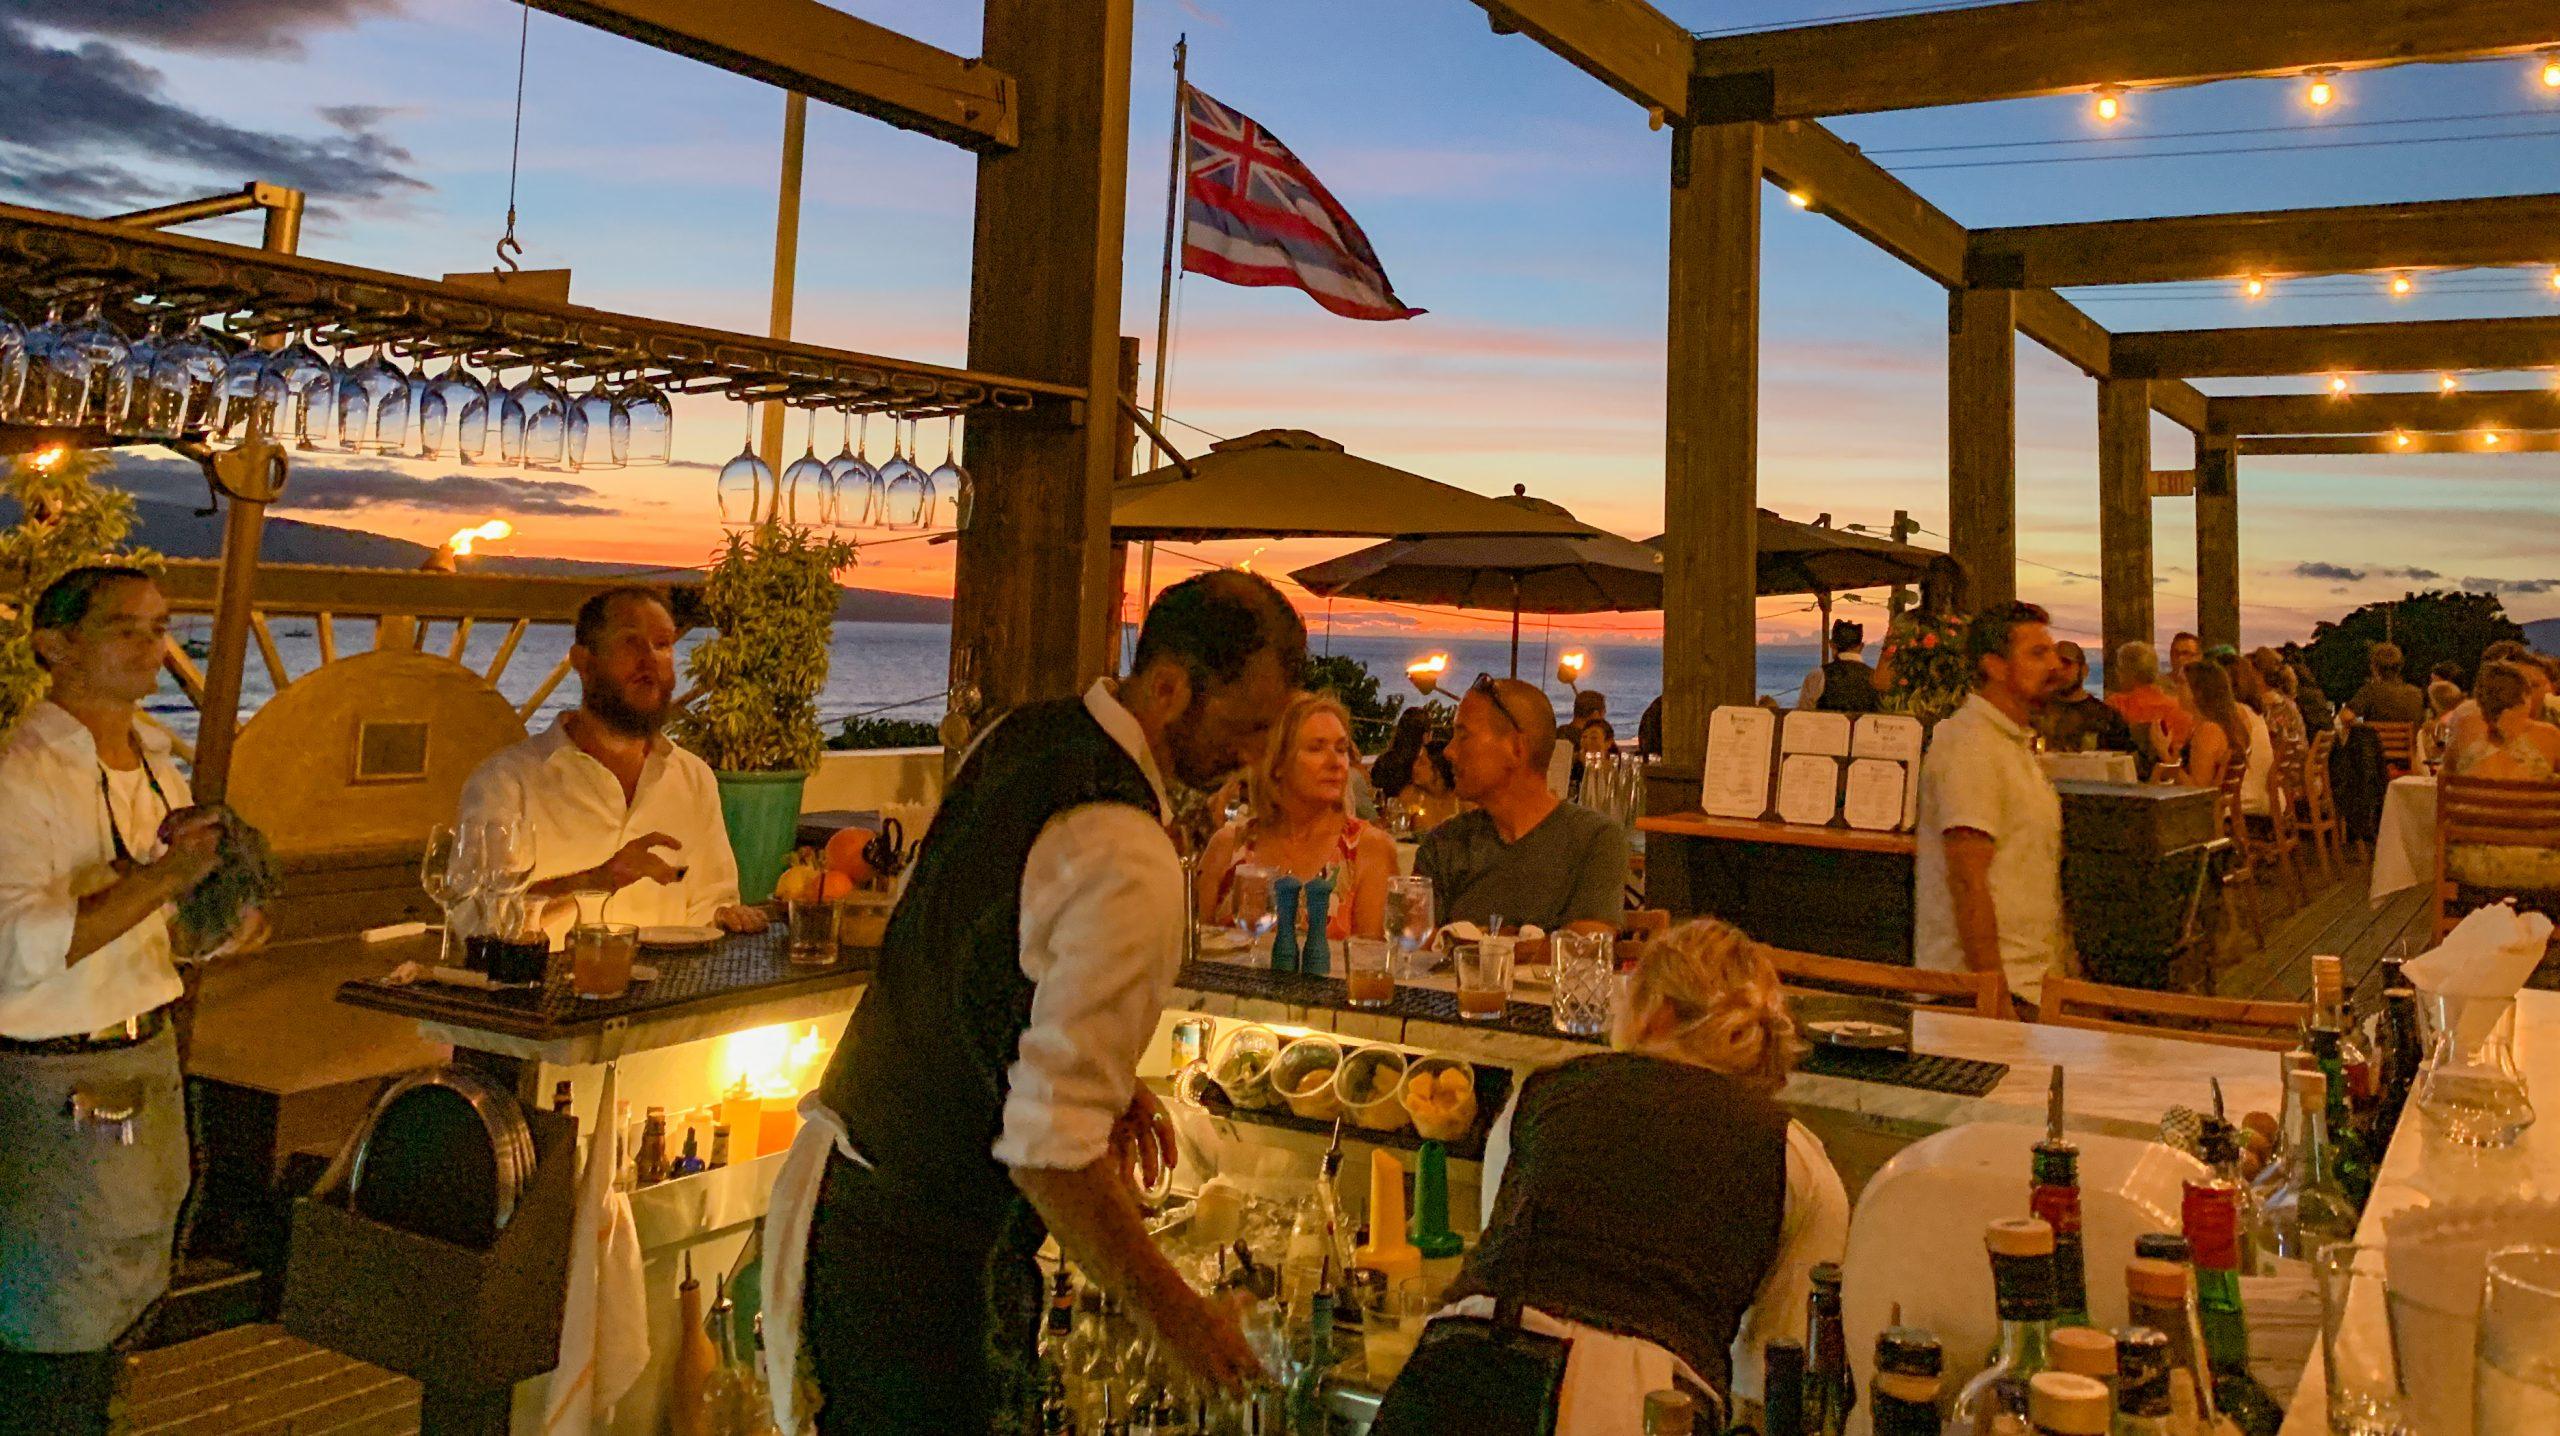 Restaurants Can Increase Capacity When Hawai'i Vaccine Rate Reaches 60%